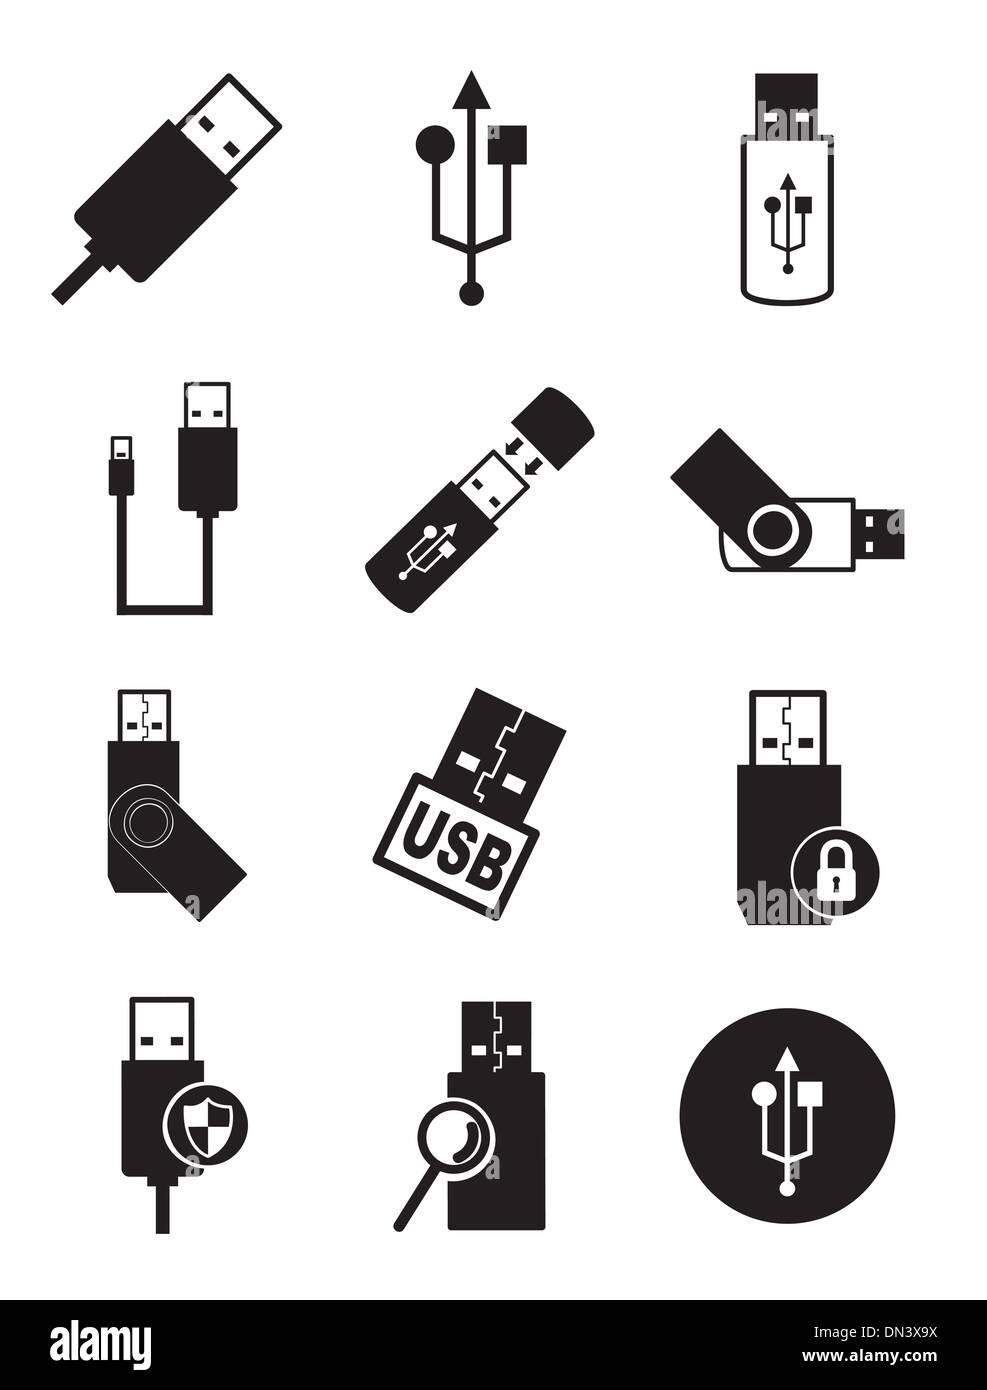 usb icons - Stock Image